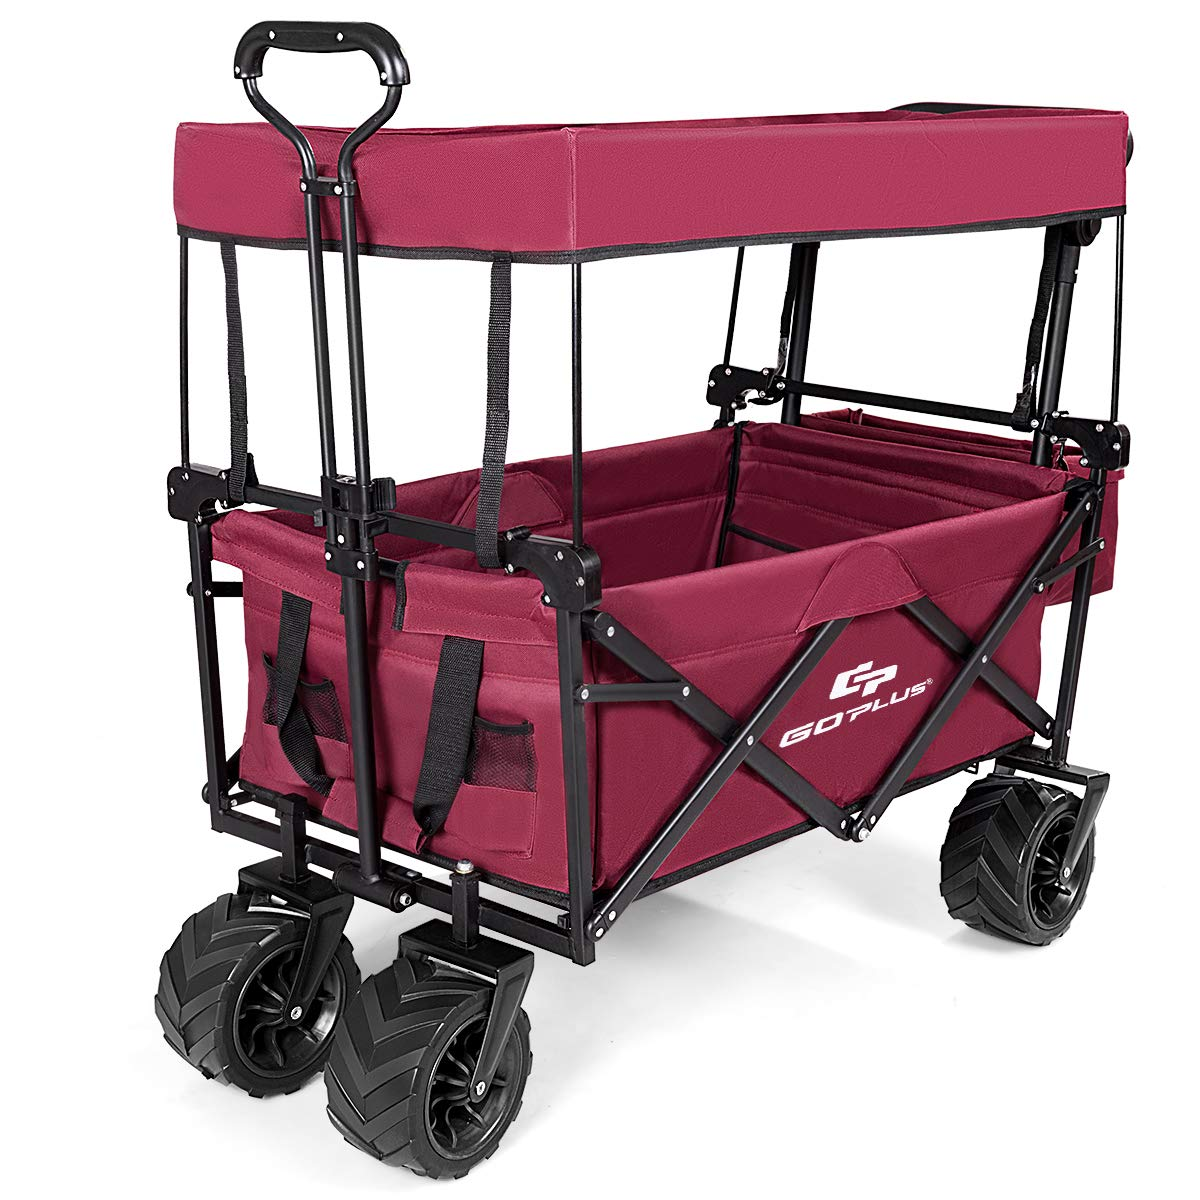 Goplus Collapsible Folding Wagon Cart, Utility Garden Cart Collapsible Outdoor Trolley with Sun/Rain Shade, Push Bar for Shopping, Beach, Lawn, Sports